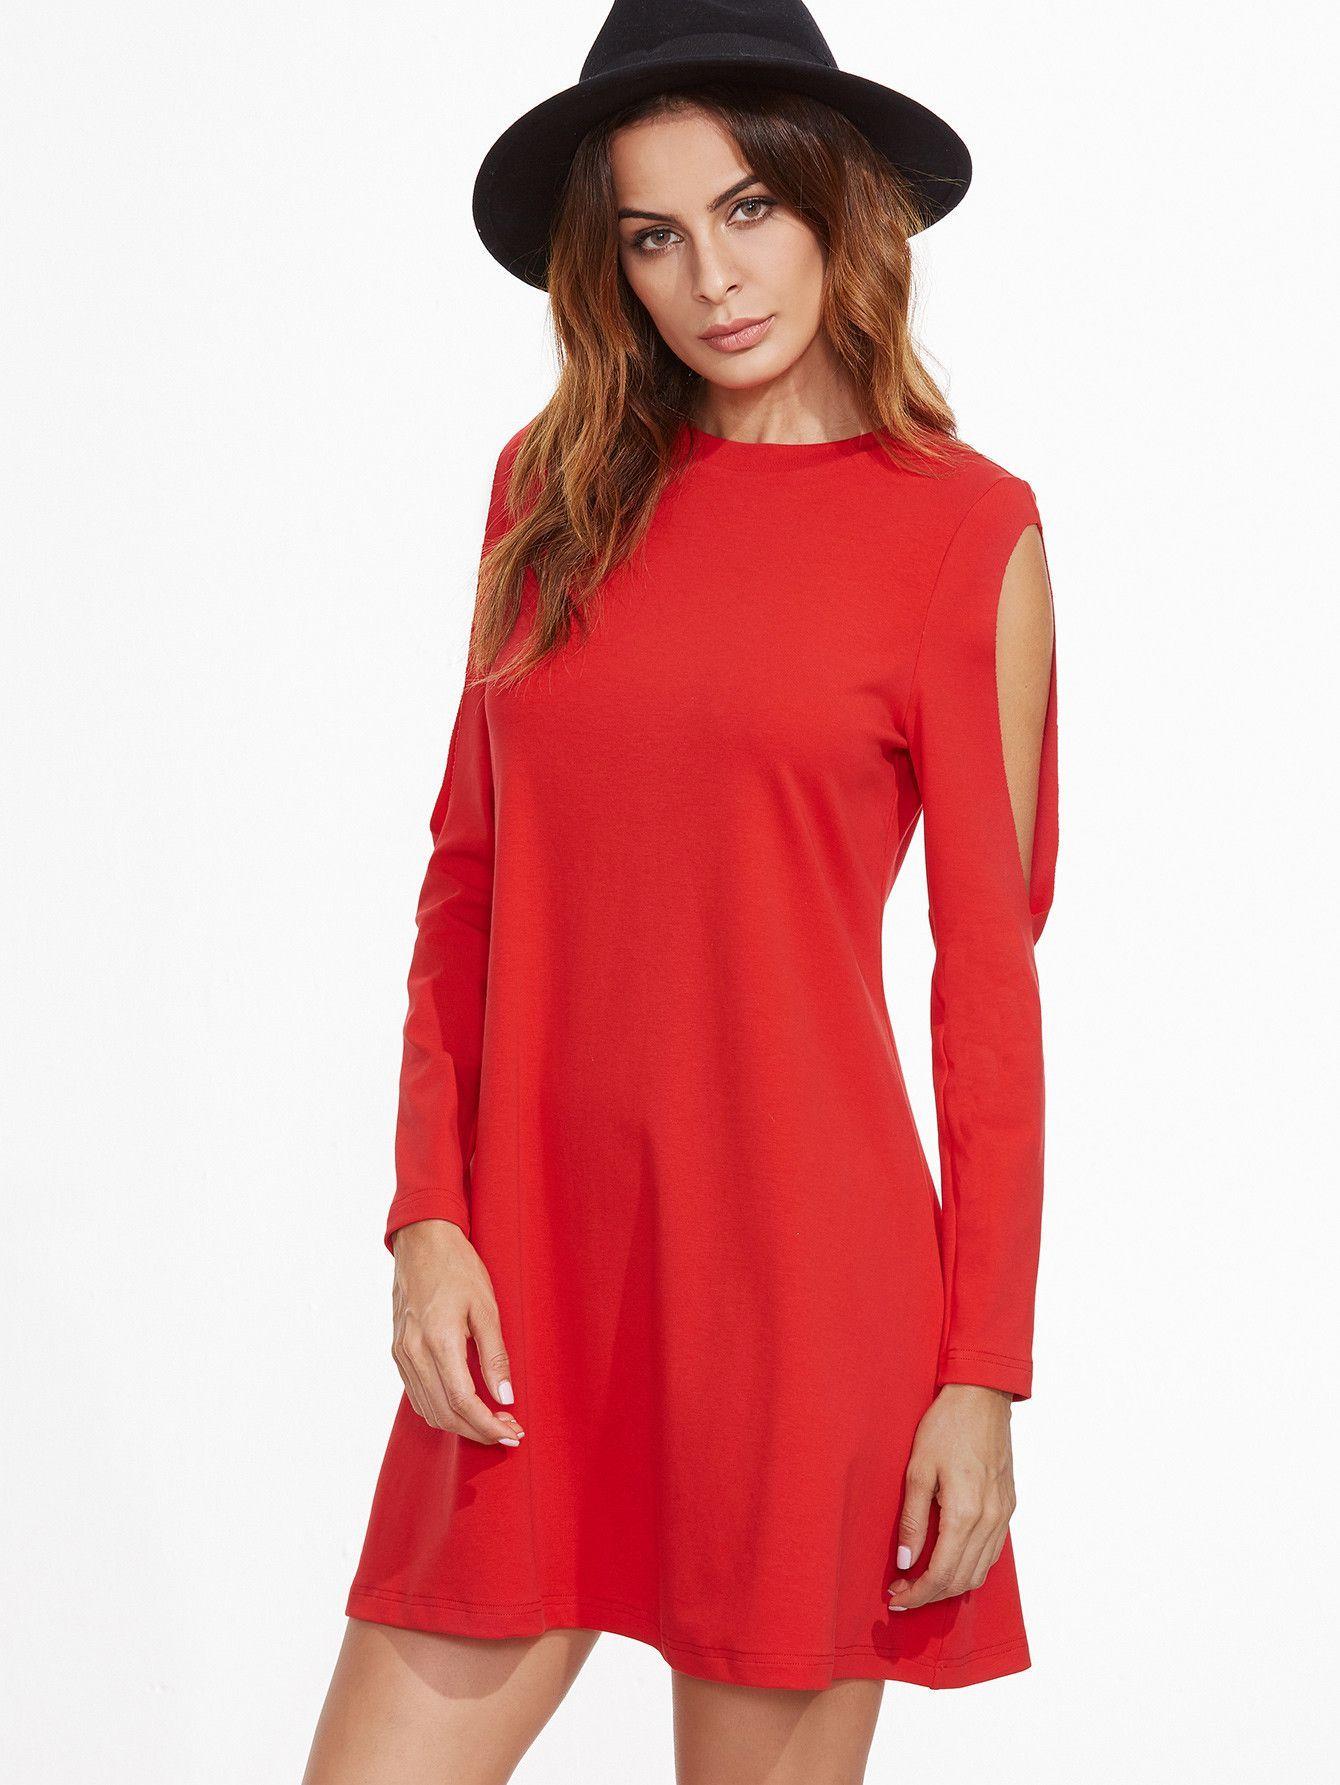 Red crew neck long sleeve dress pinterest sleeved dress fall